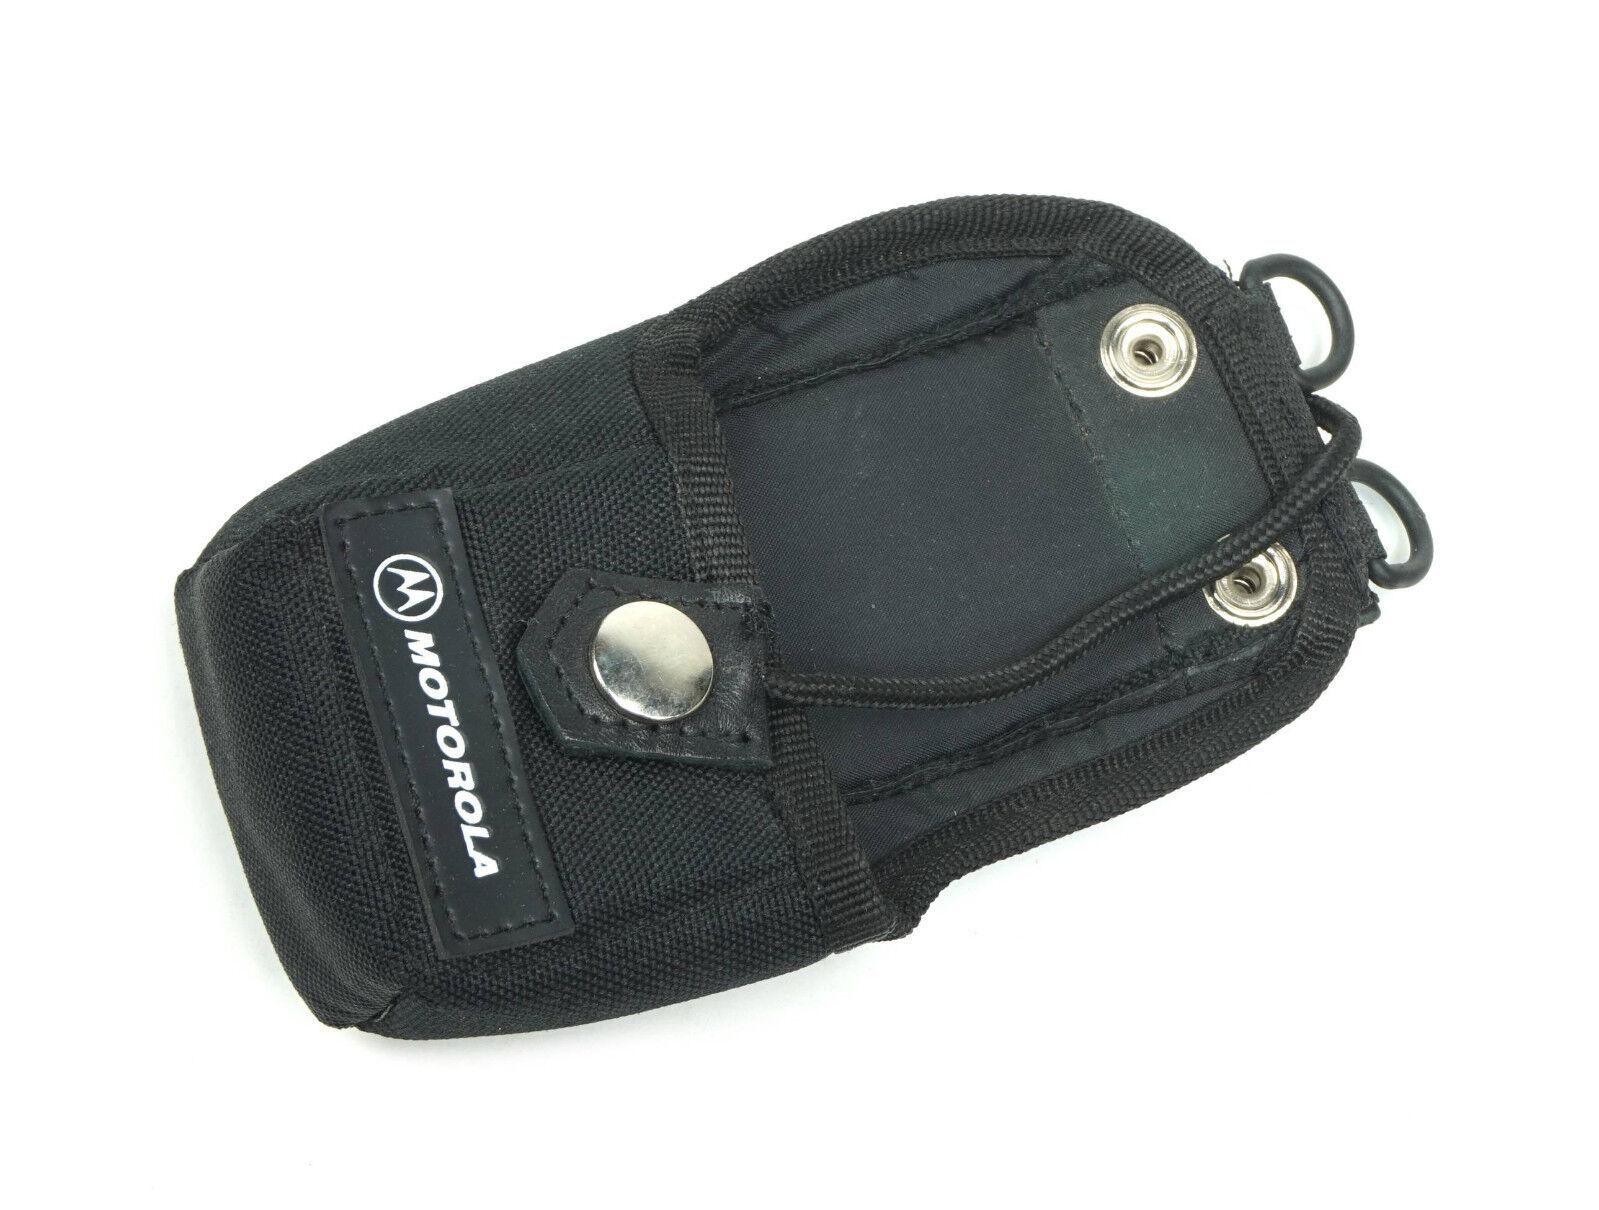 motorola radio carrying case